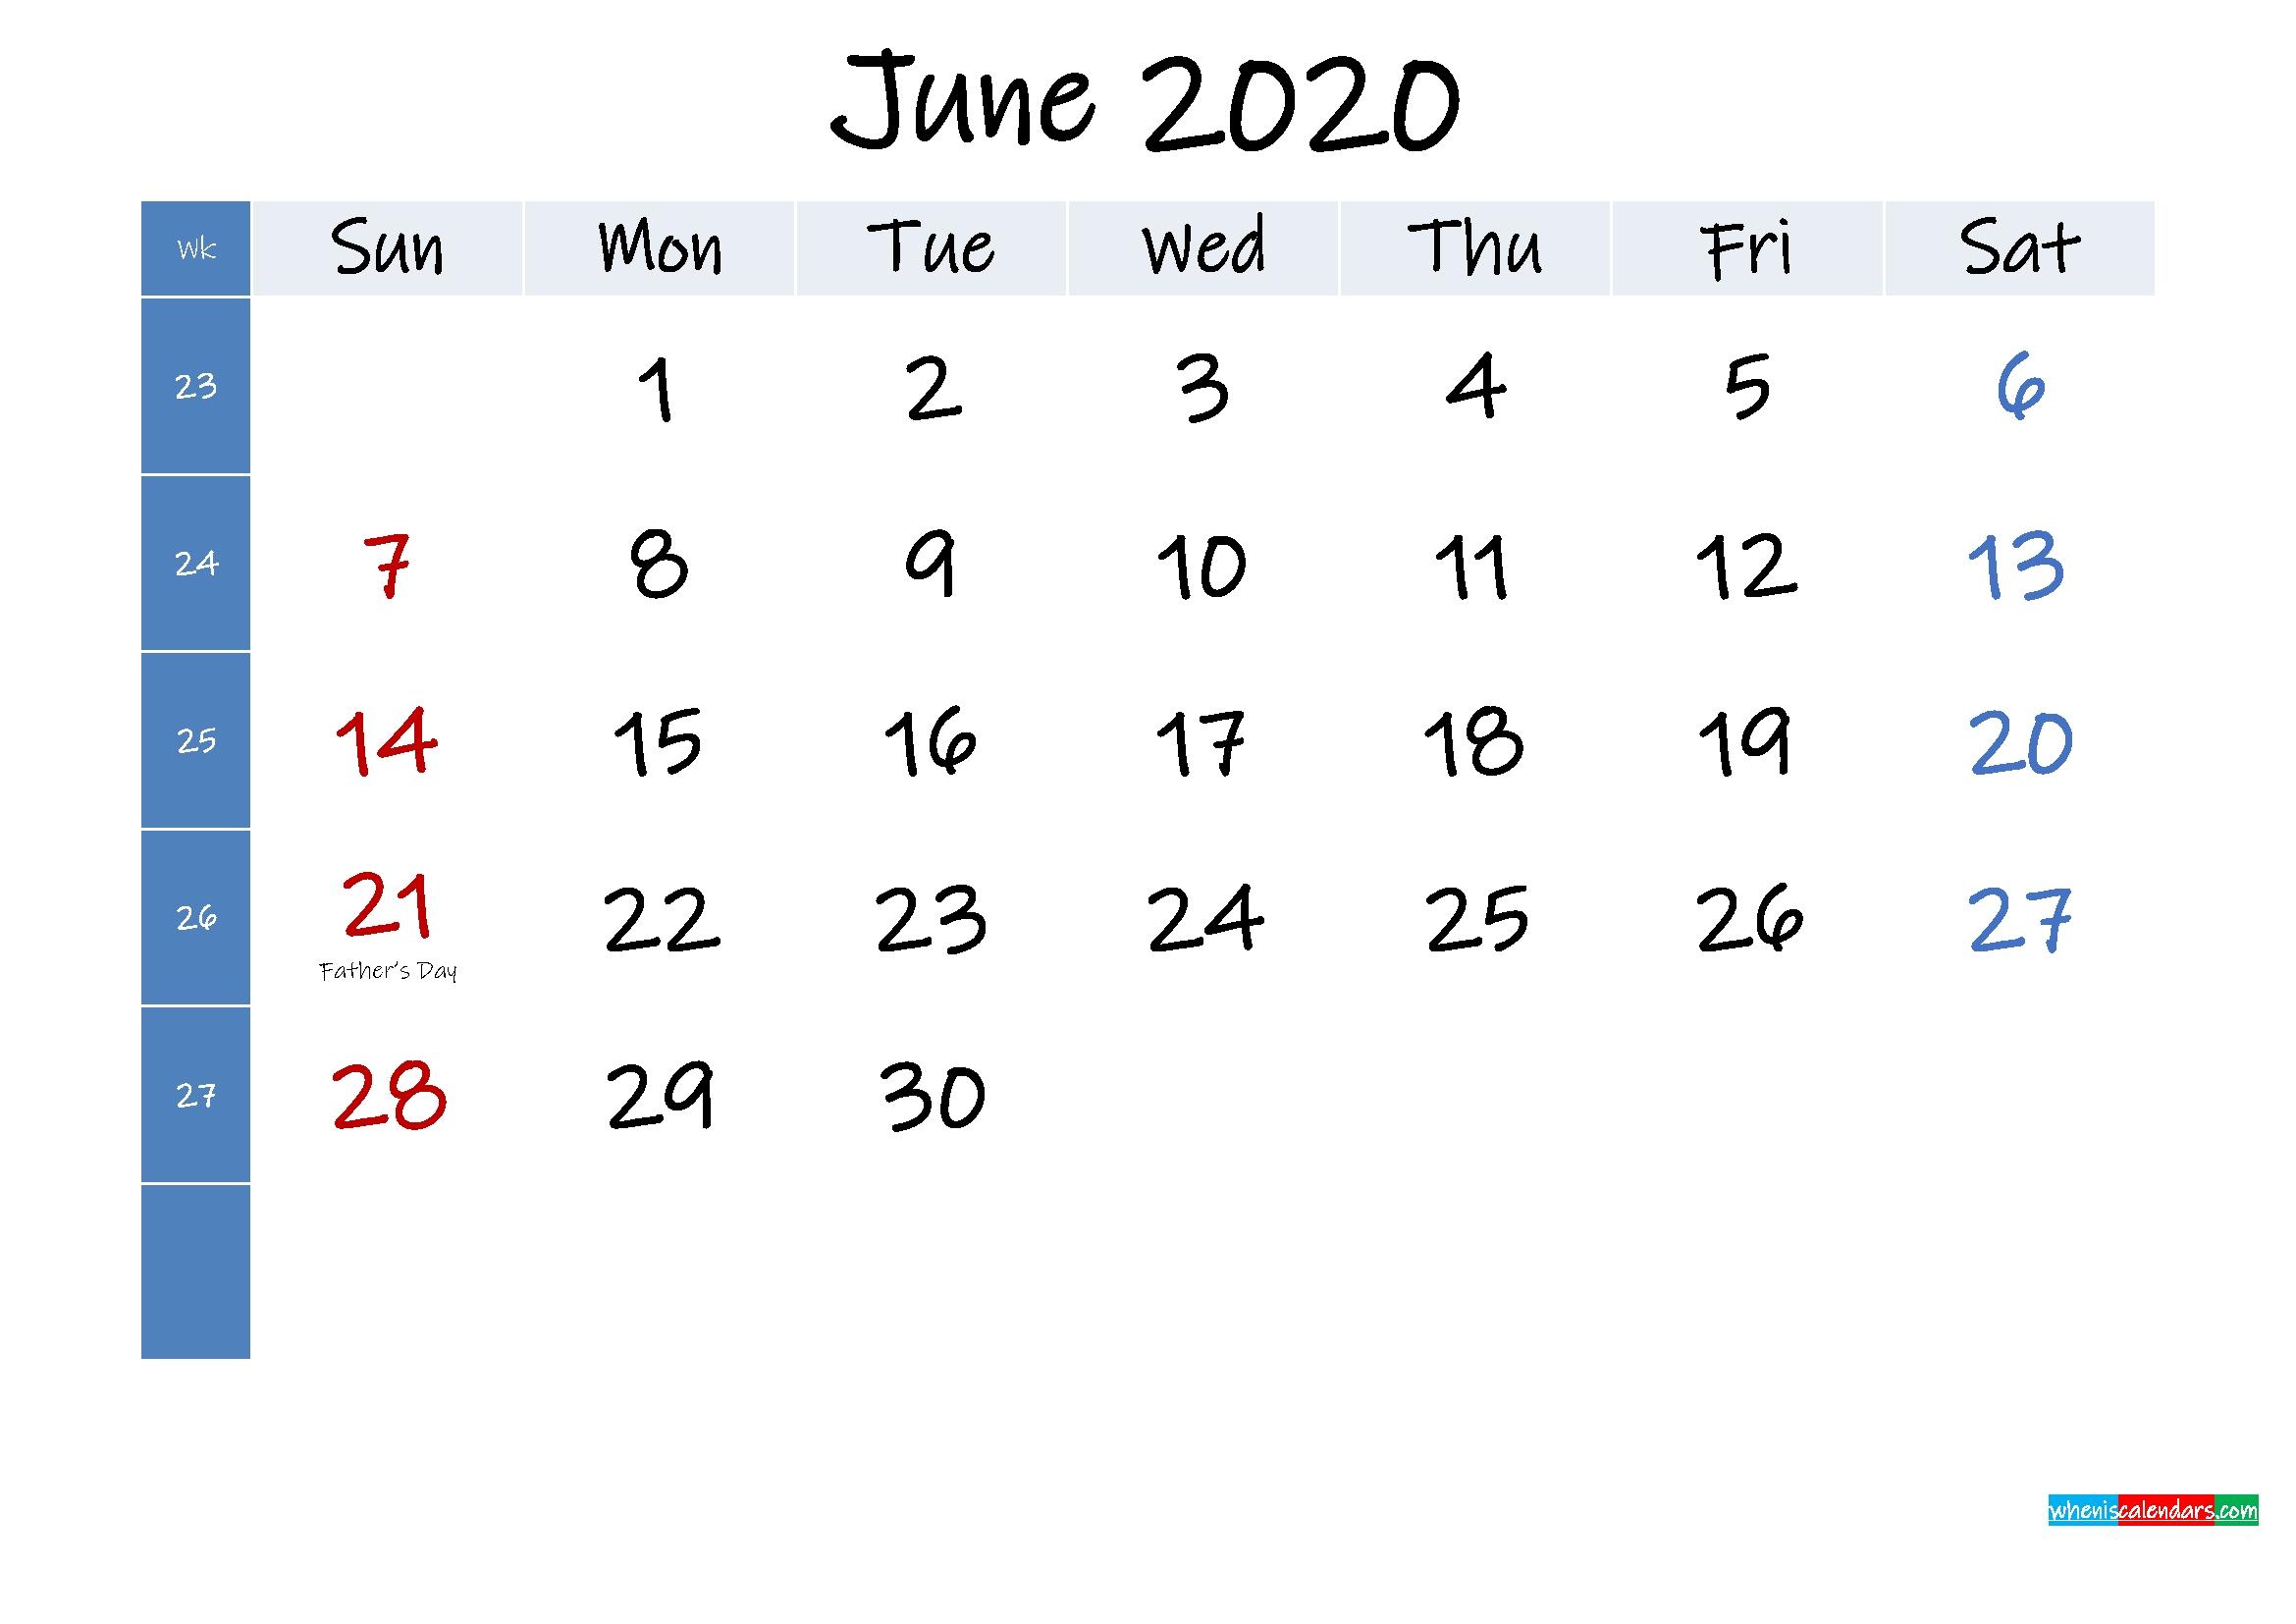 June 2020 Free Printable Calendar With Holidays - Template No.ink20M354 - Free Printable 2021 June 2021 Calendar With Holidays Usa